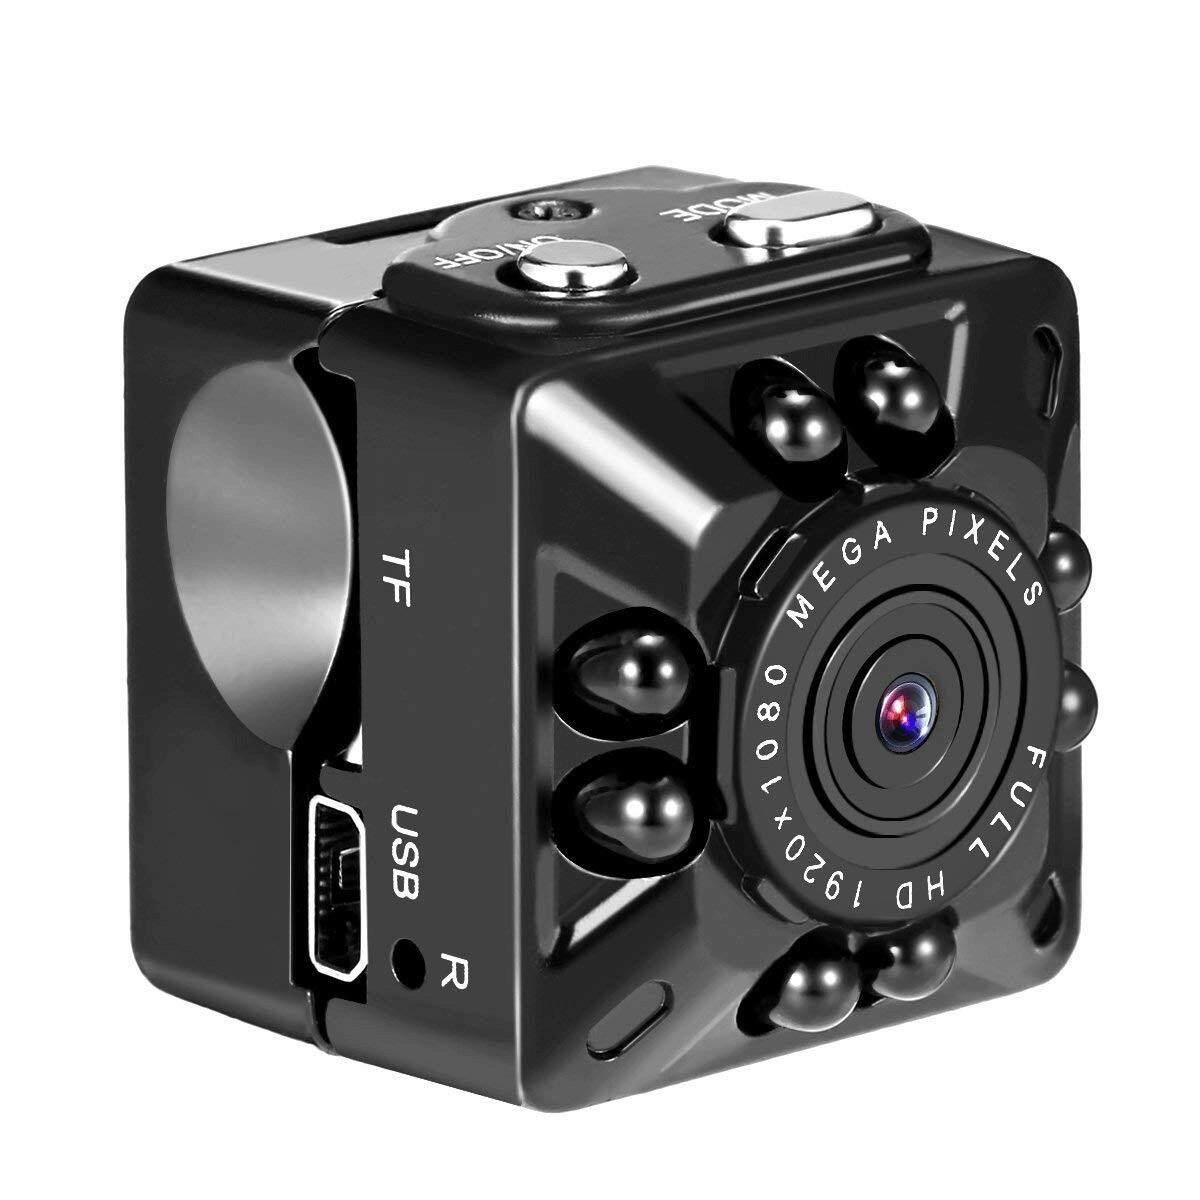 Hiqueen Kamera Keamanan Penuh Hd 1080 P Deteksi Gerakan Perekam Pengelihatan Malam By Hiquuen.